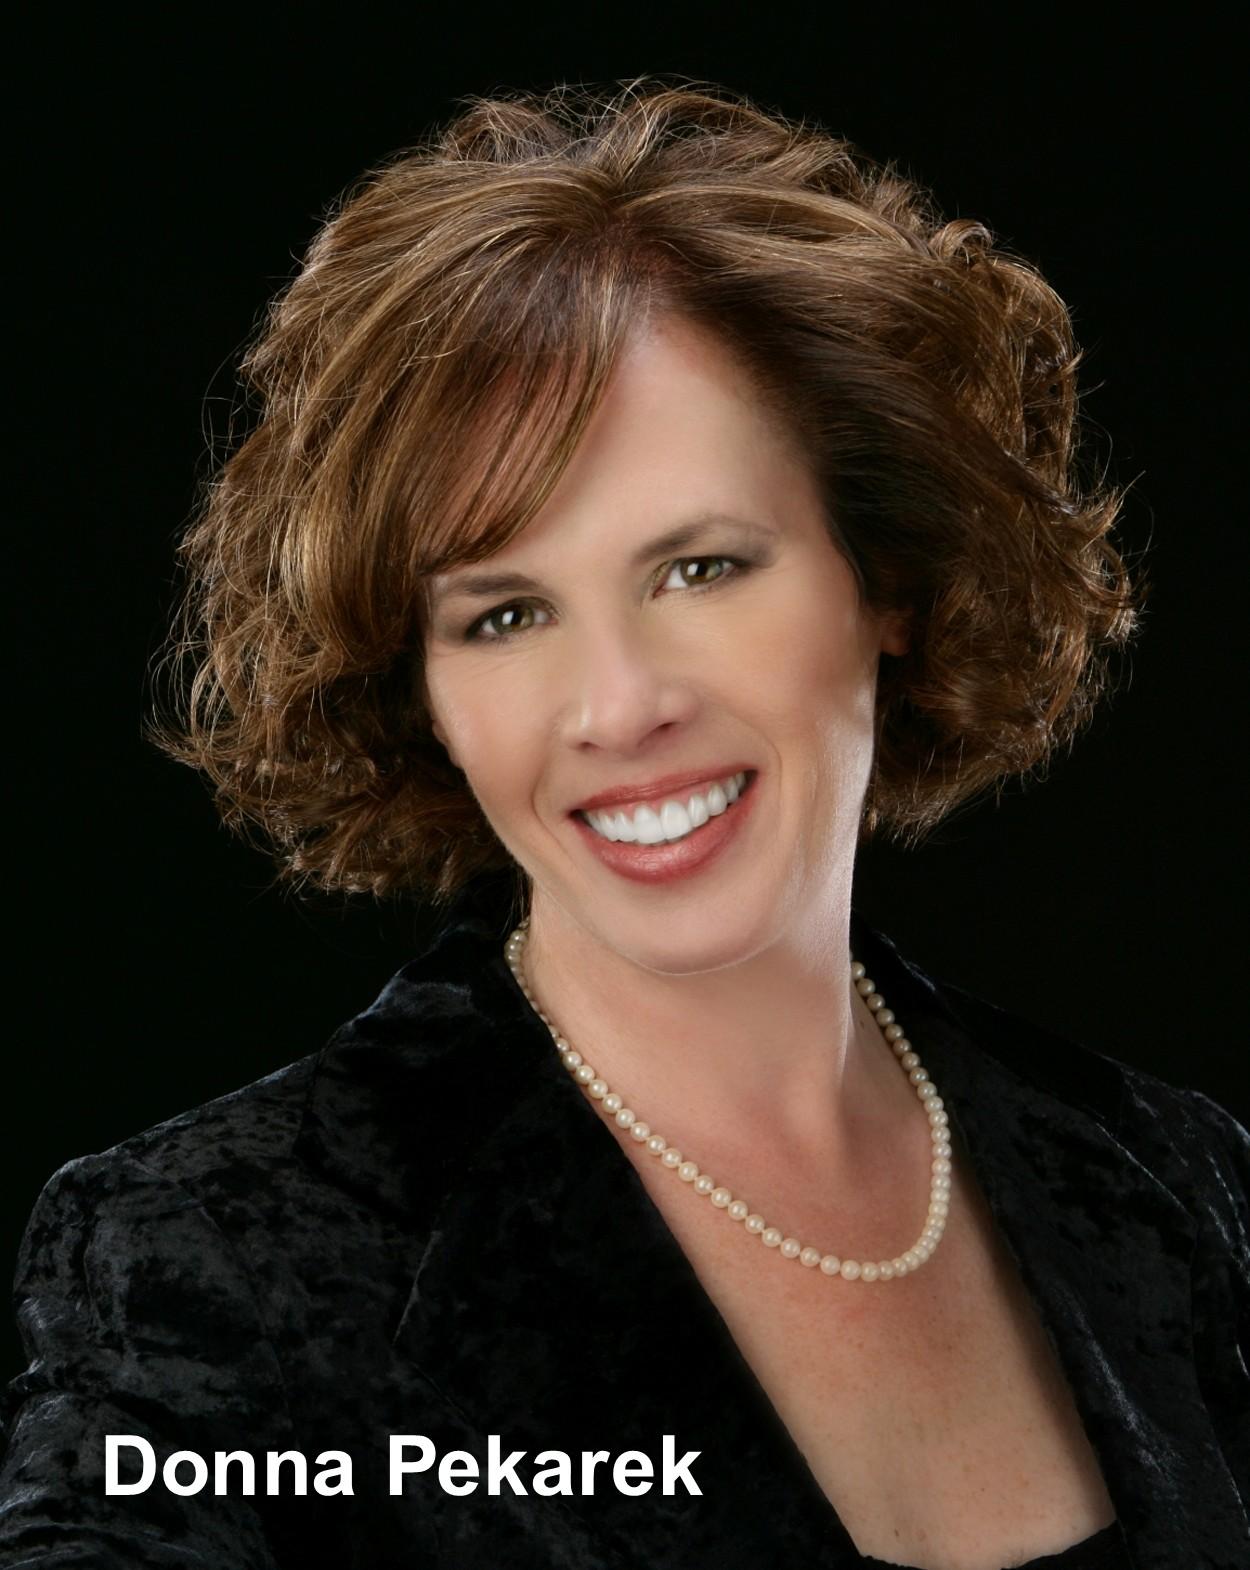 Donna Pekarek